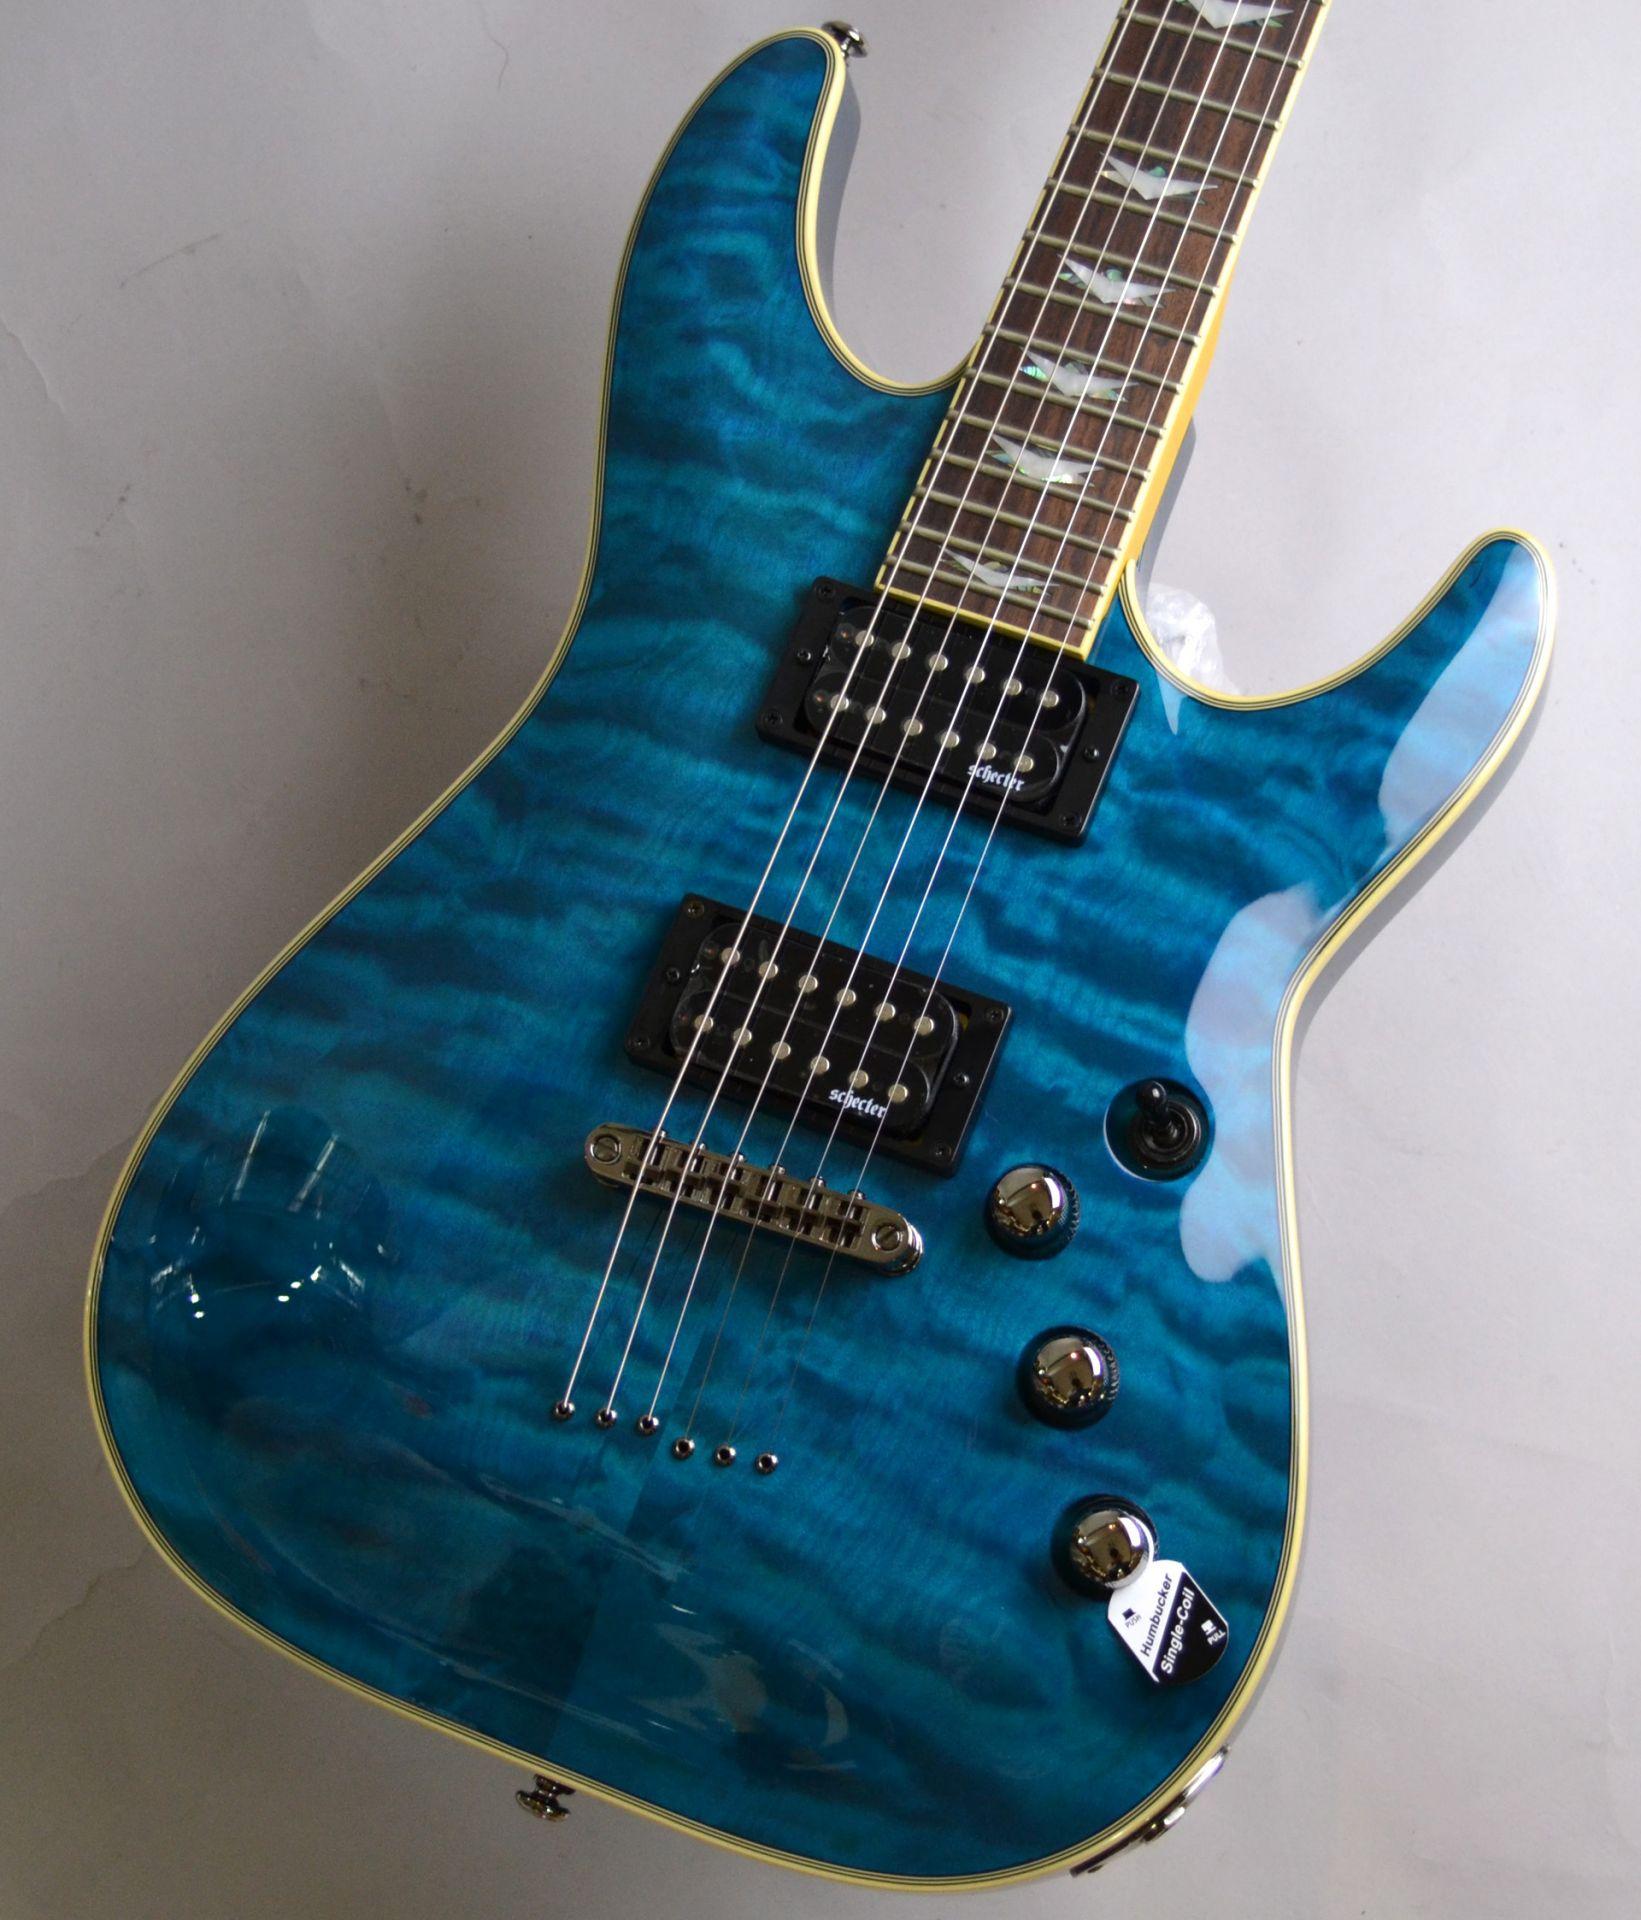 AD-OM6-EXT Trans Ocean Blueのボディトップ-アップ画像